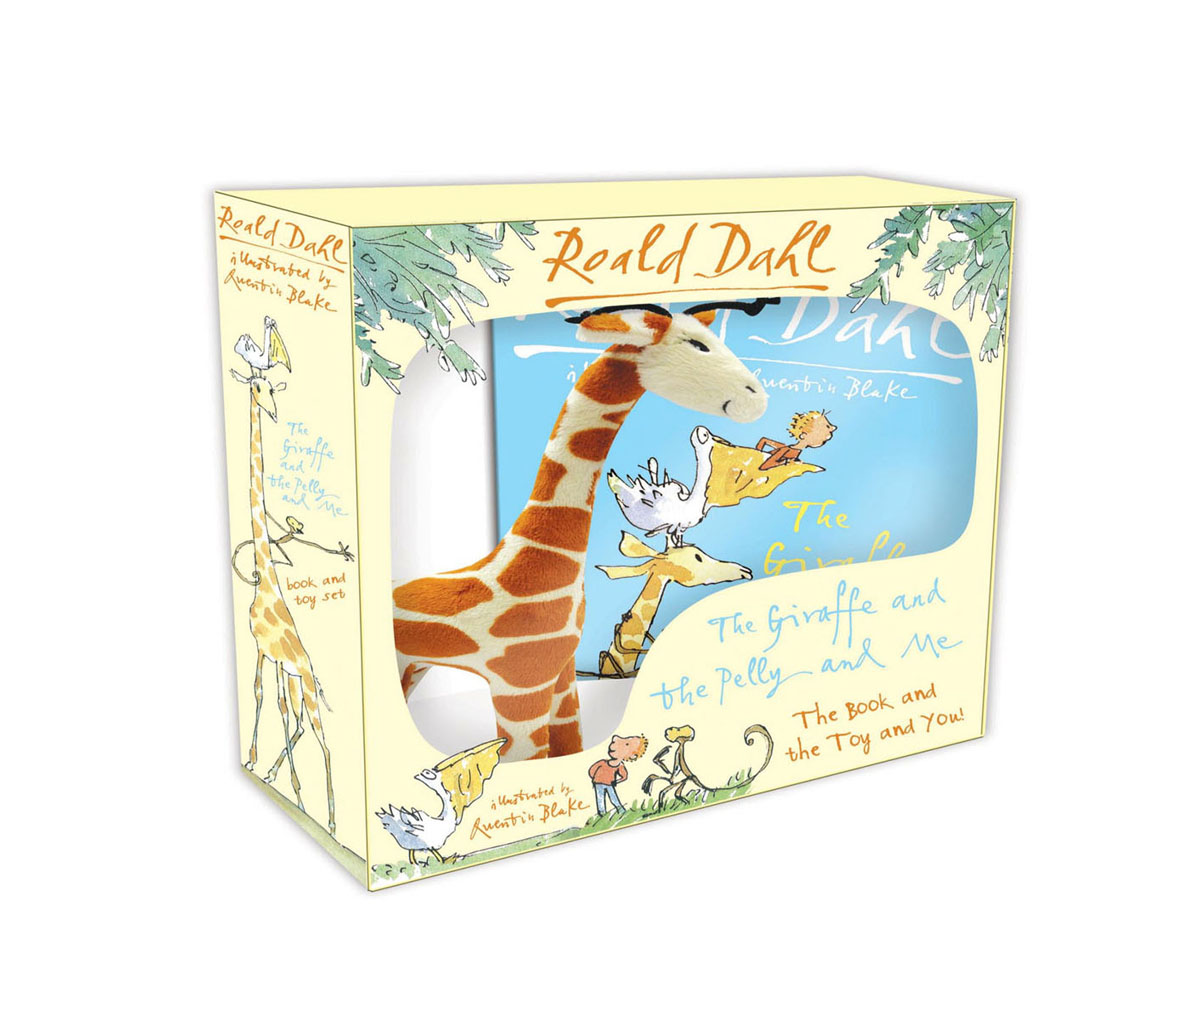 The Giraffe And The Pelly And Me сызранова в е ред me to you мишкина книжка